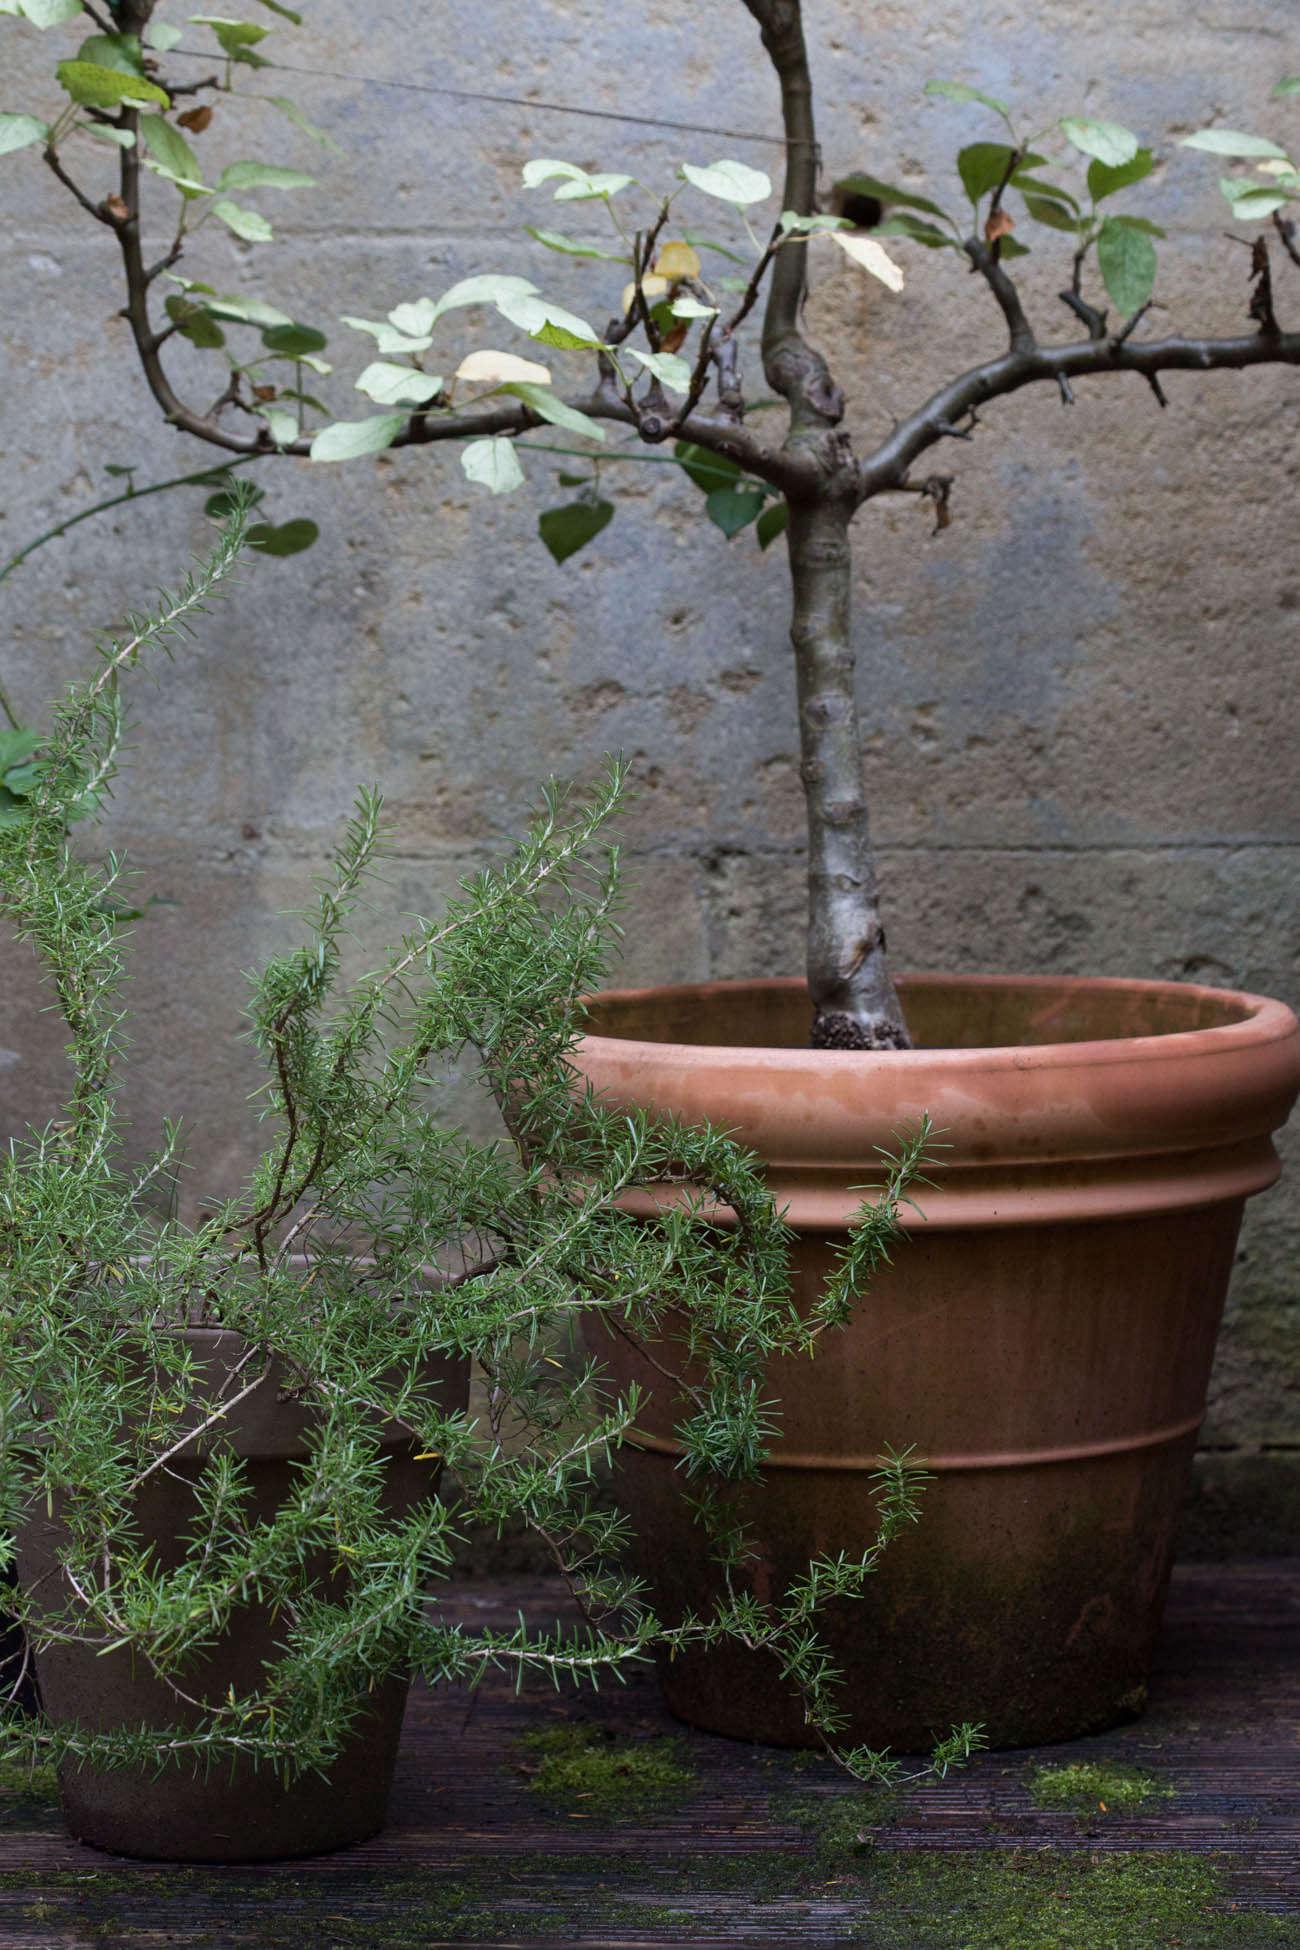 Ambre-store-france-mimi-giboin-gardenista-030